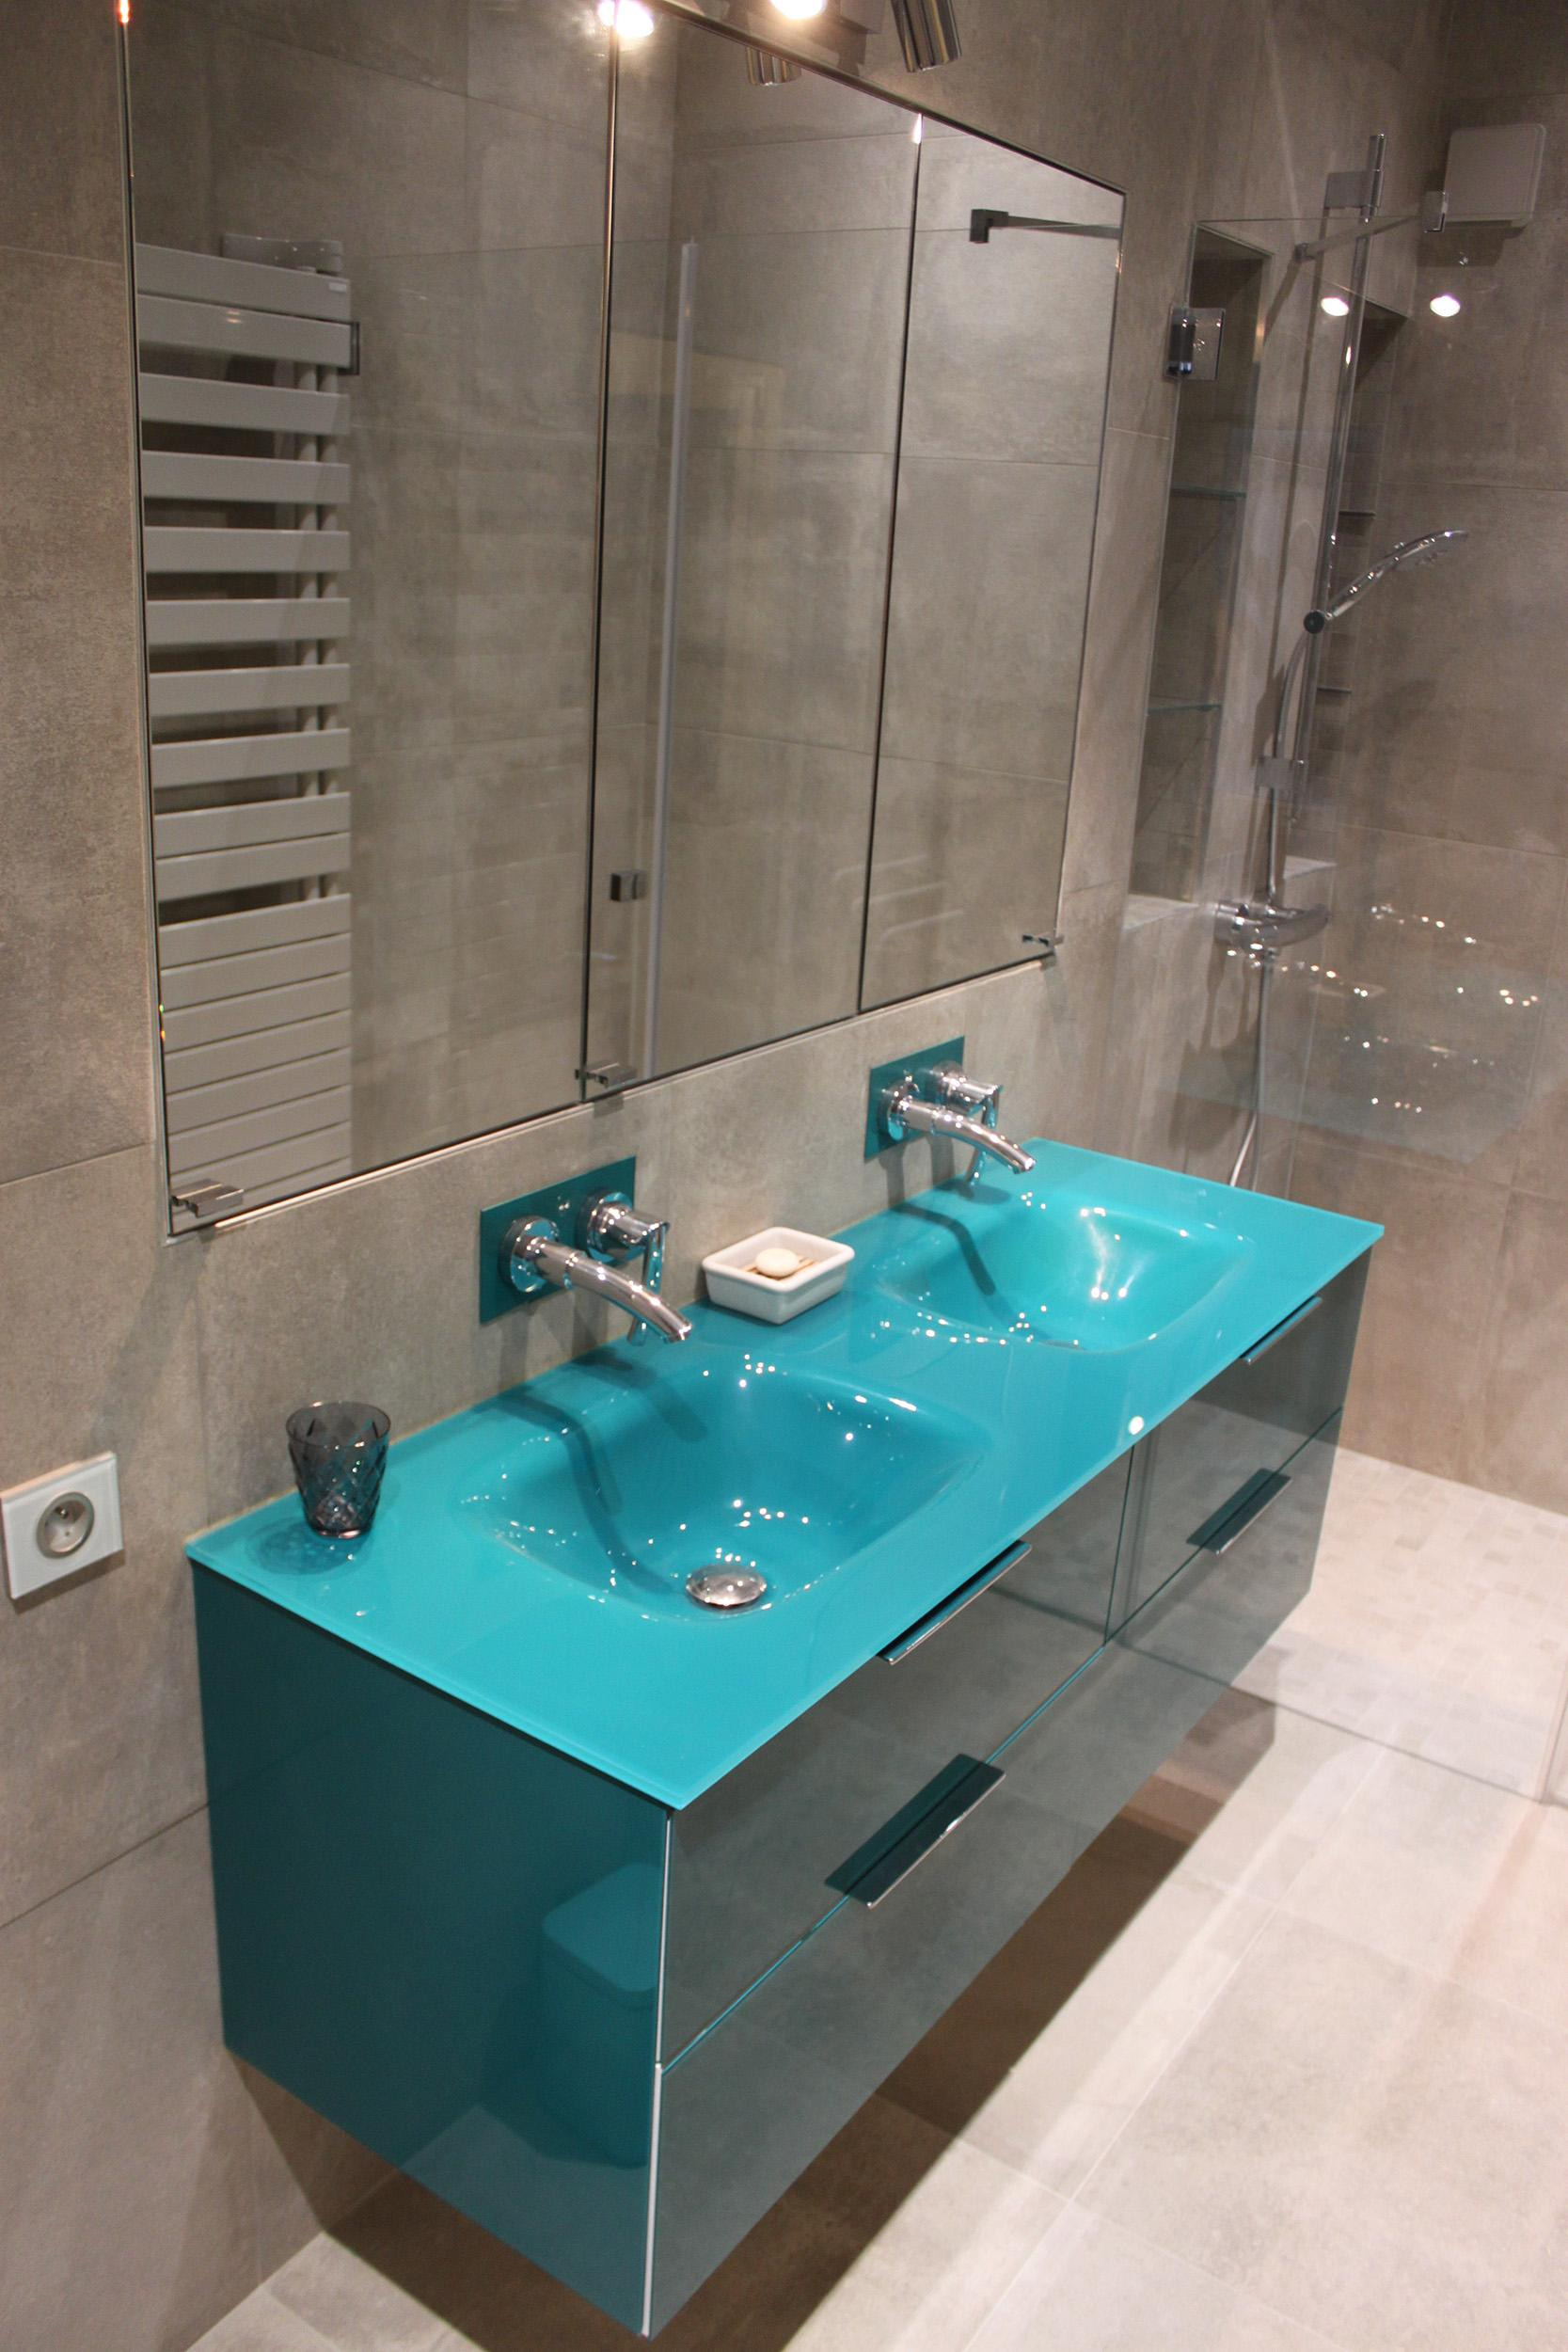 vasque en verre avec meuble elegant double vasque salle de bain en verre meuble salle de bain suspendu  weng double vasque en verre tremp with meuble salle de bain avec vasque en  verre ...